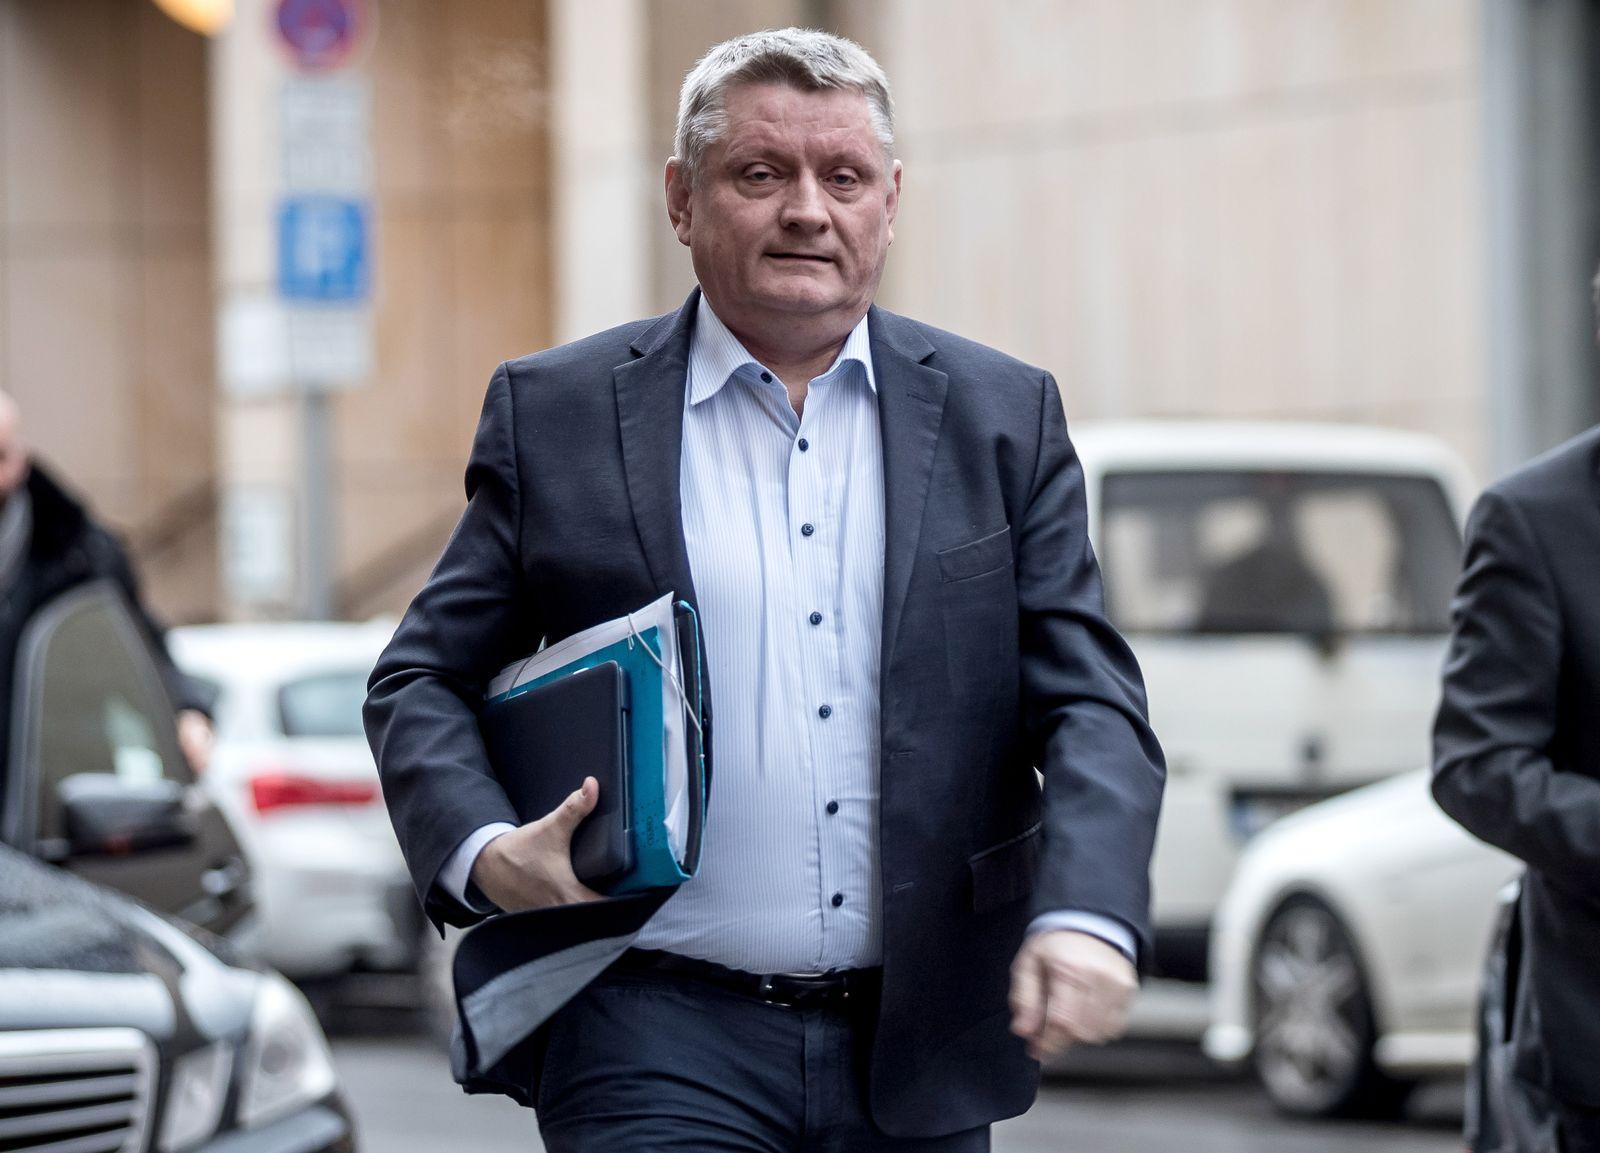 Kabinett Spekulation/ CDU/ Hermann Gröhe